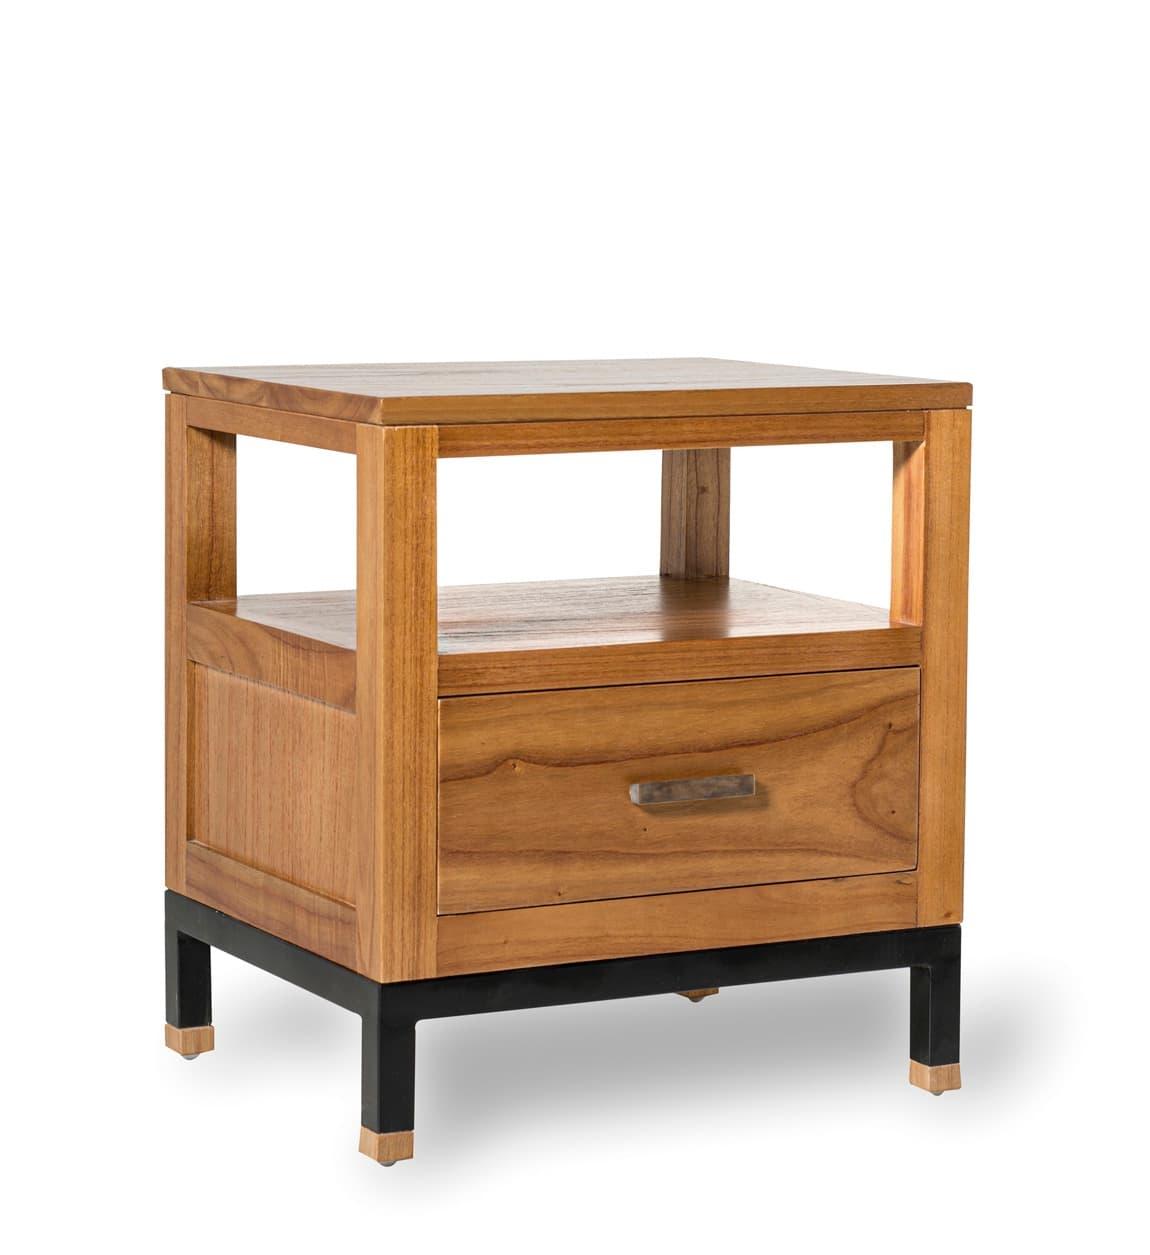 Noptiera din lemn cu 1 sertar, Madhu Natural, l50xA40xH55 cm somproduct.ro